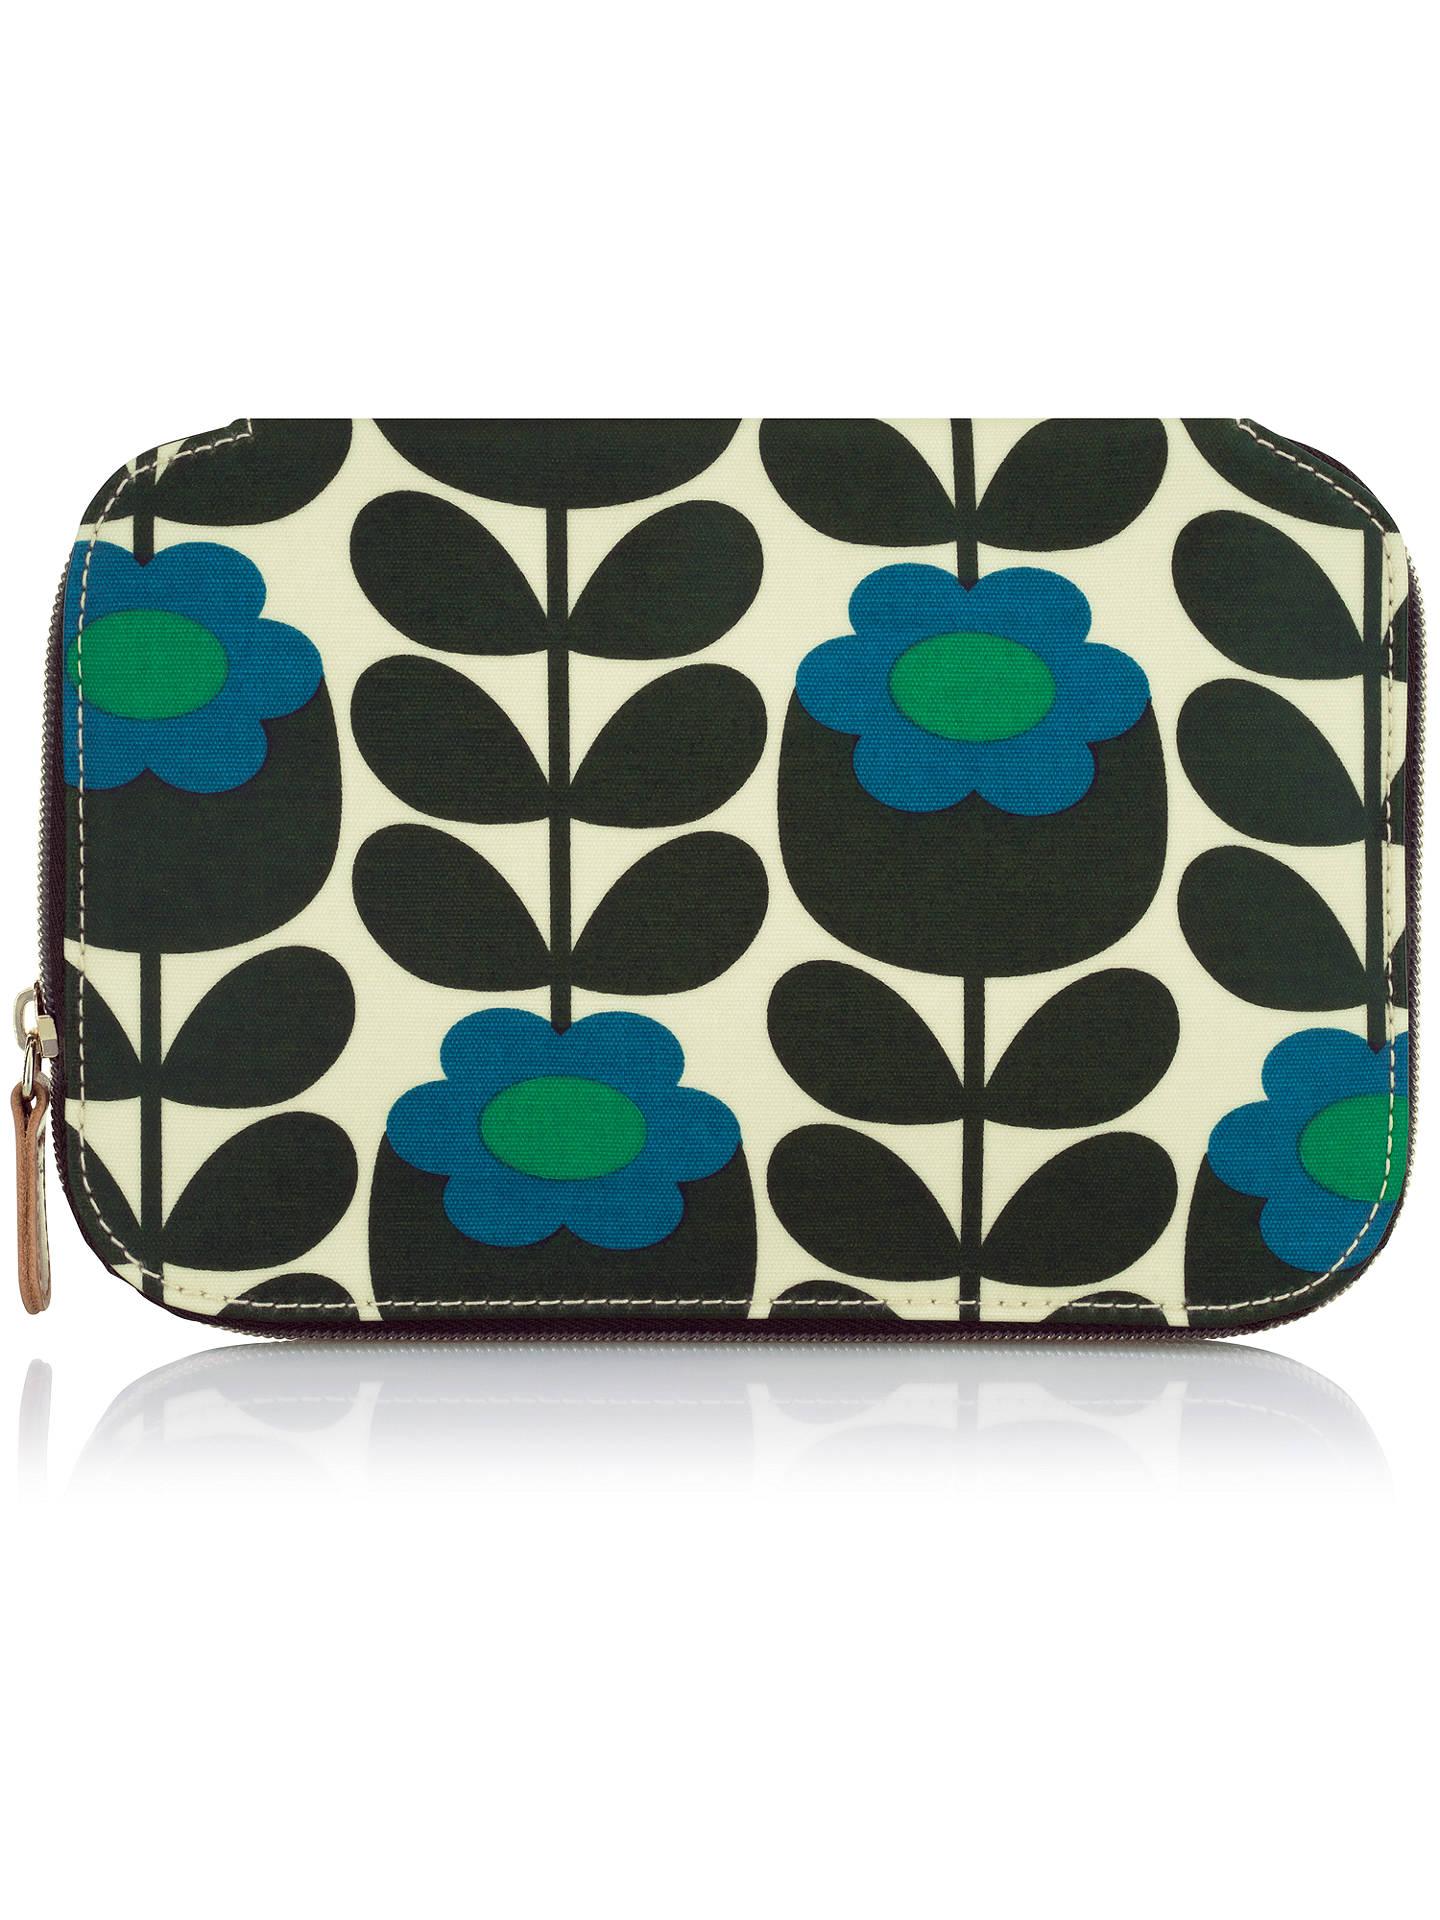 Orla Kiely Primrose Jade Cosmetic Bag Blue At John Lewis